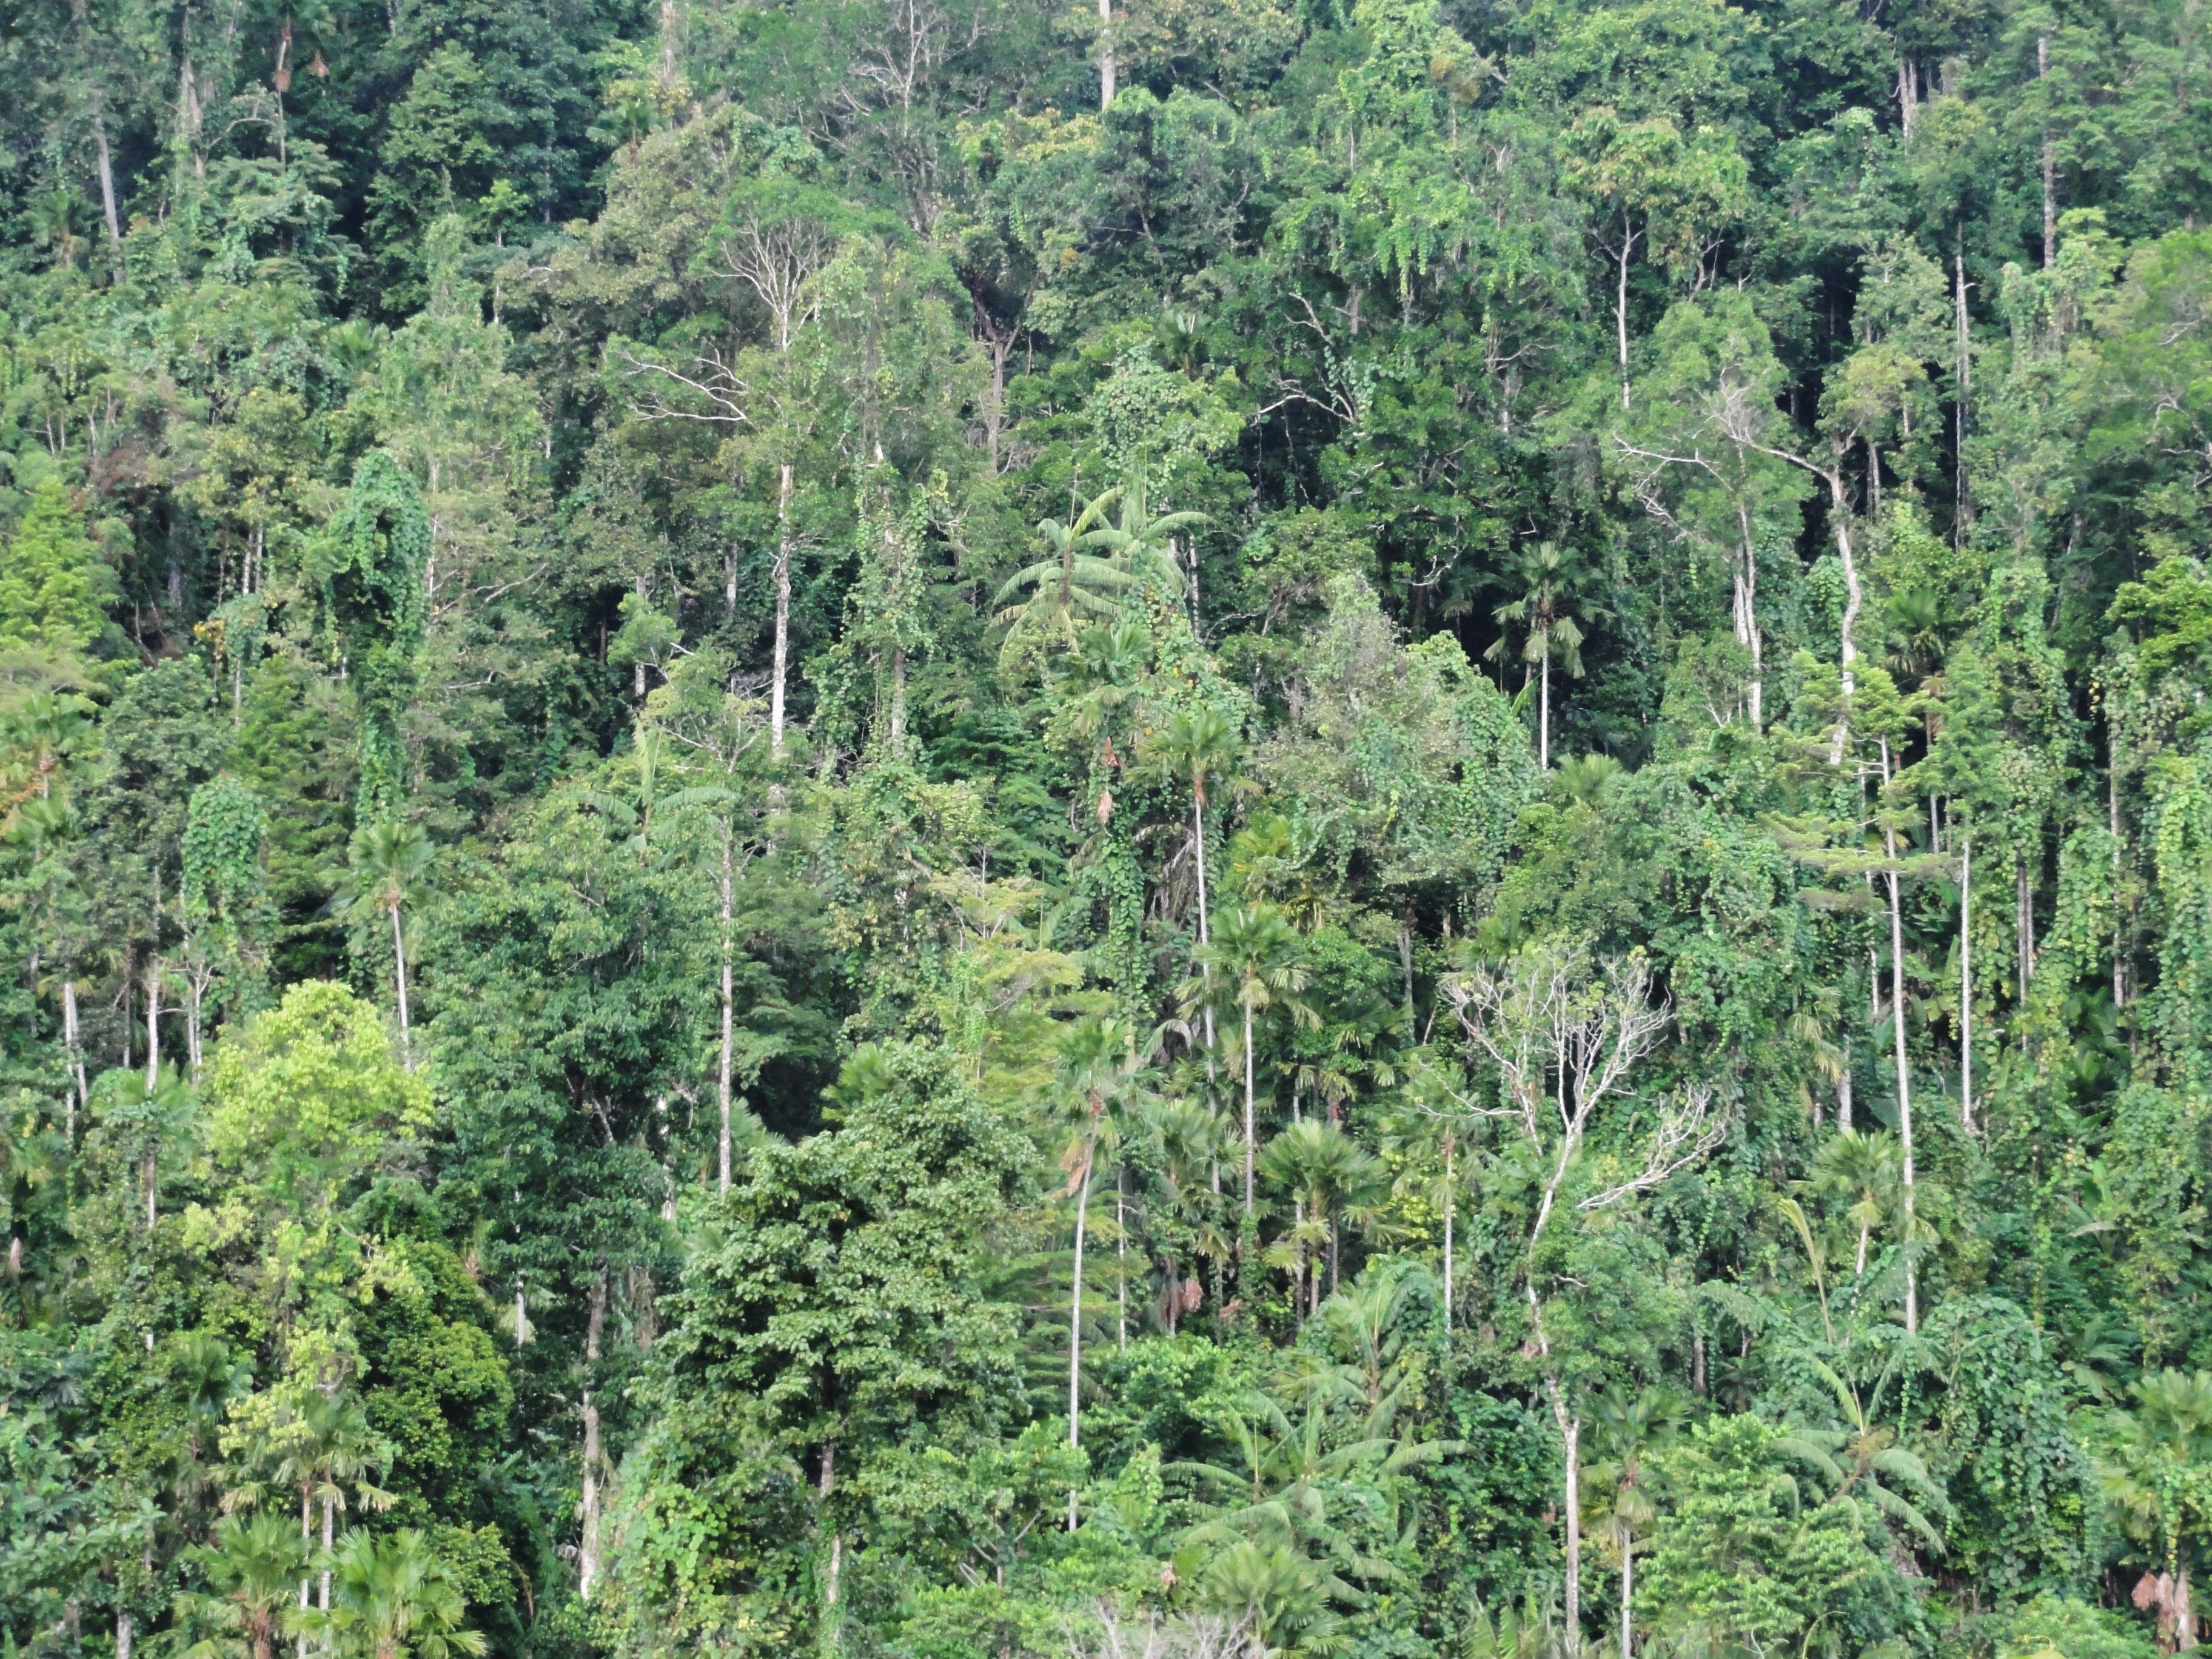 Taman Nasional Aketajawe Lolobata Wikipedia Bahasa Indonesia Ensiklopedia Bebas